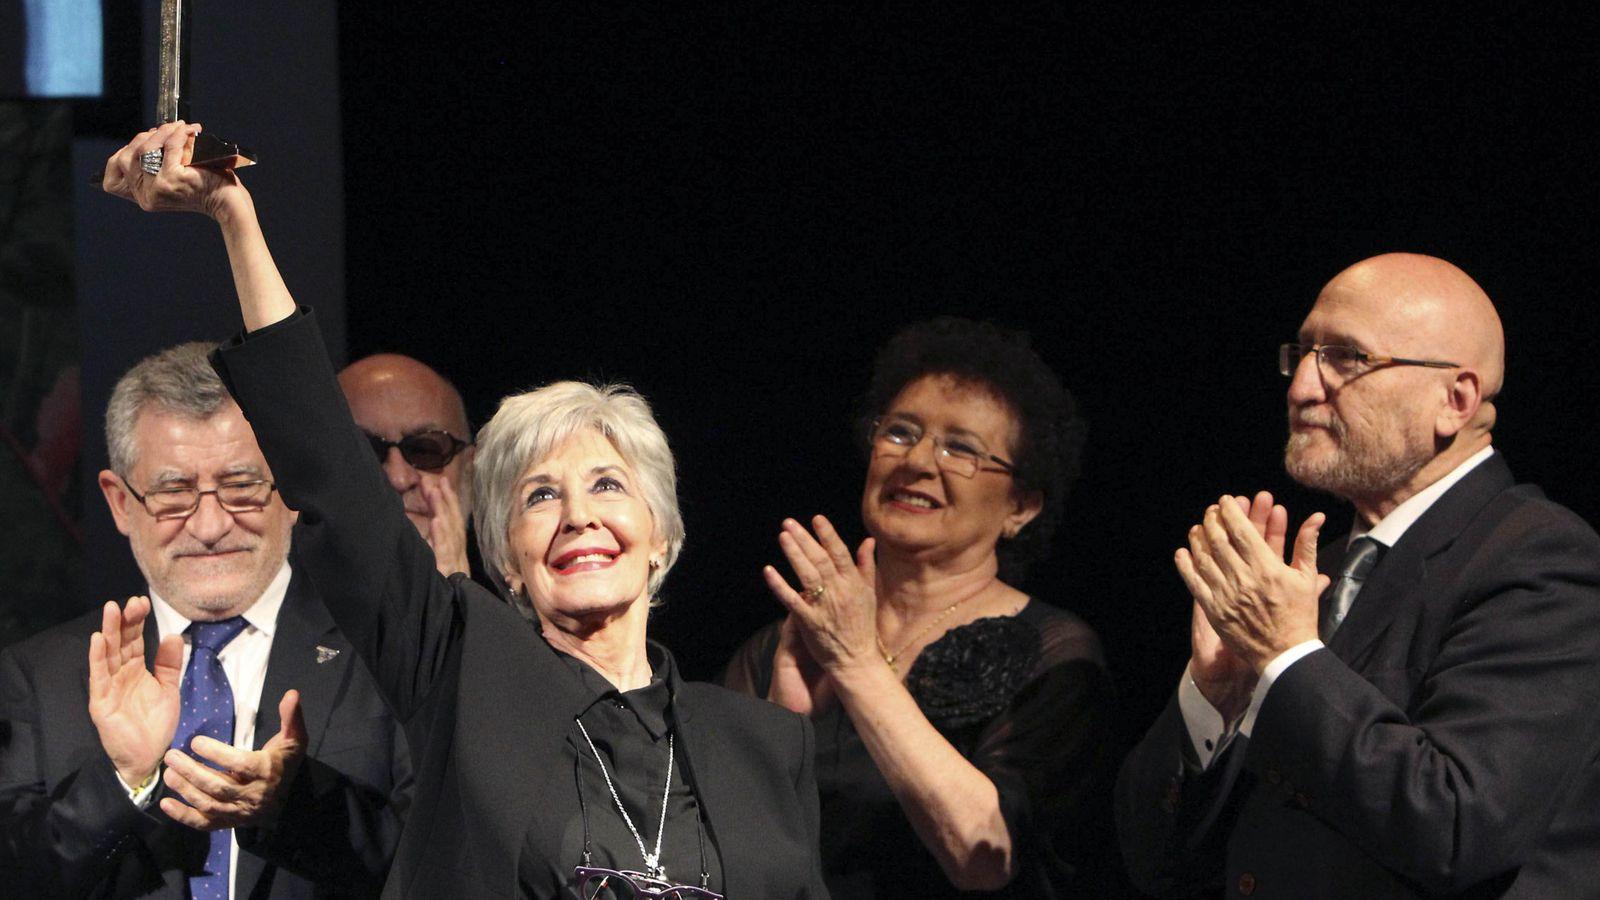 Foto: Concha Velasco recibiendo el Premio Corral de Comedias anoche (Efe)